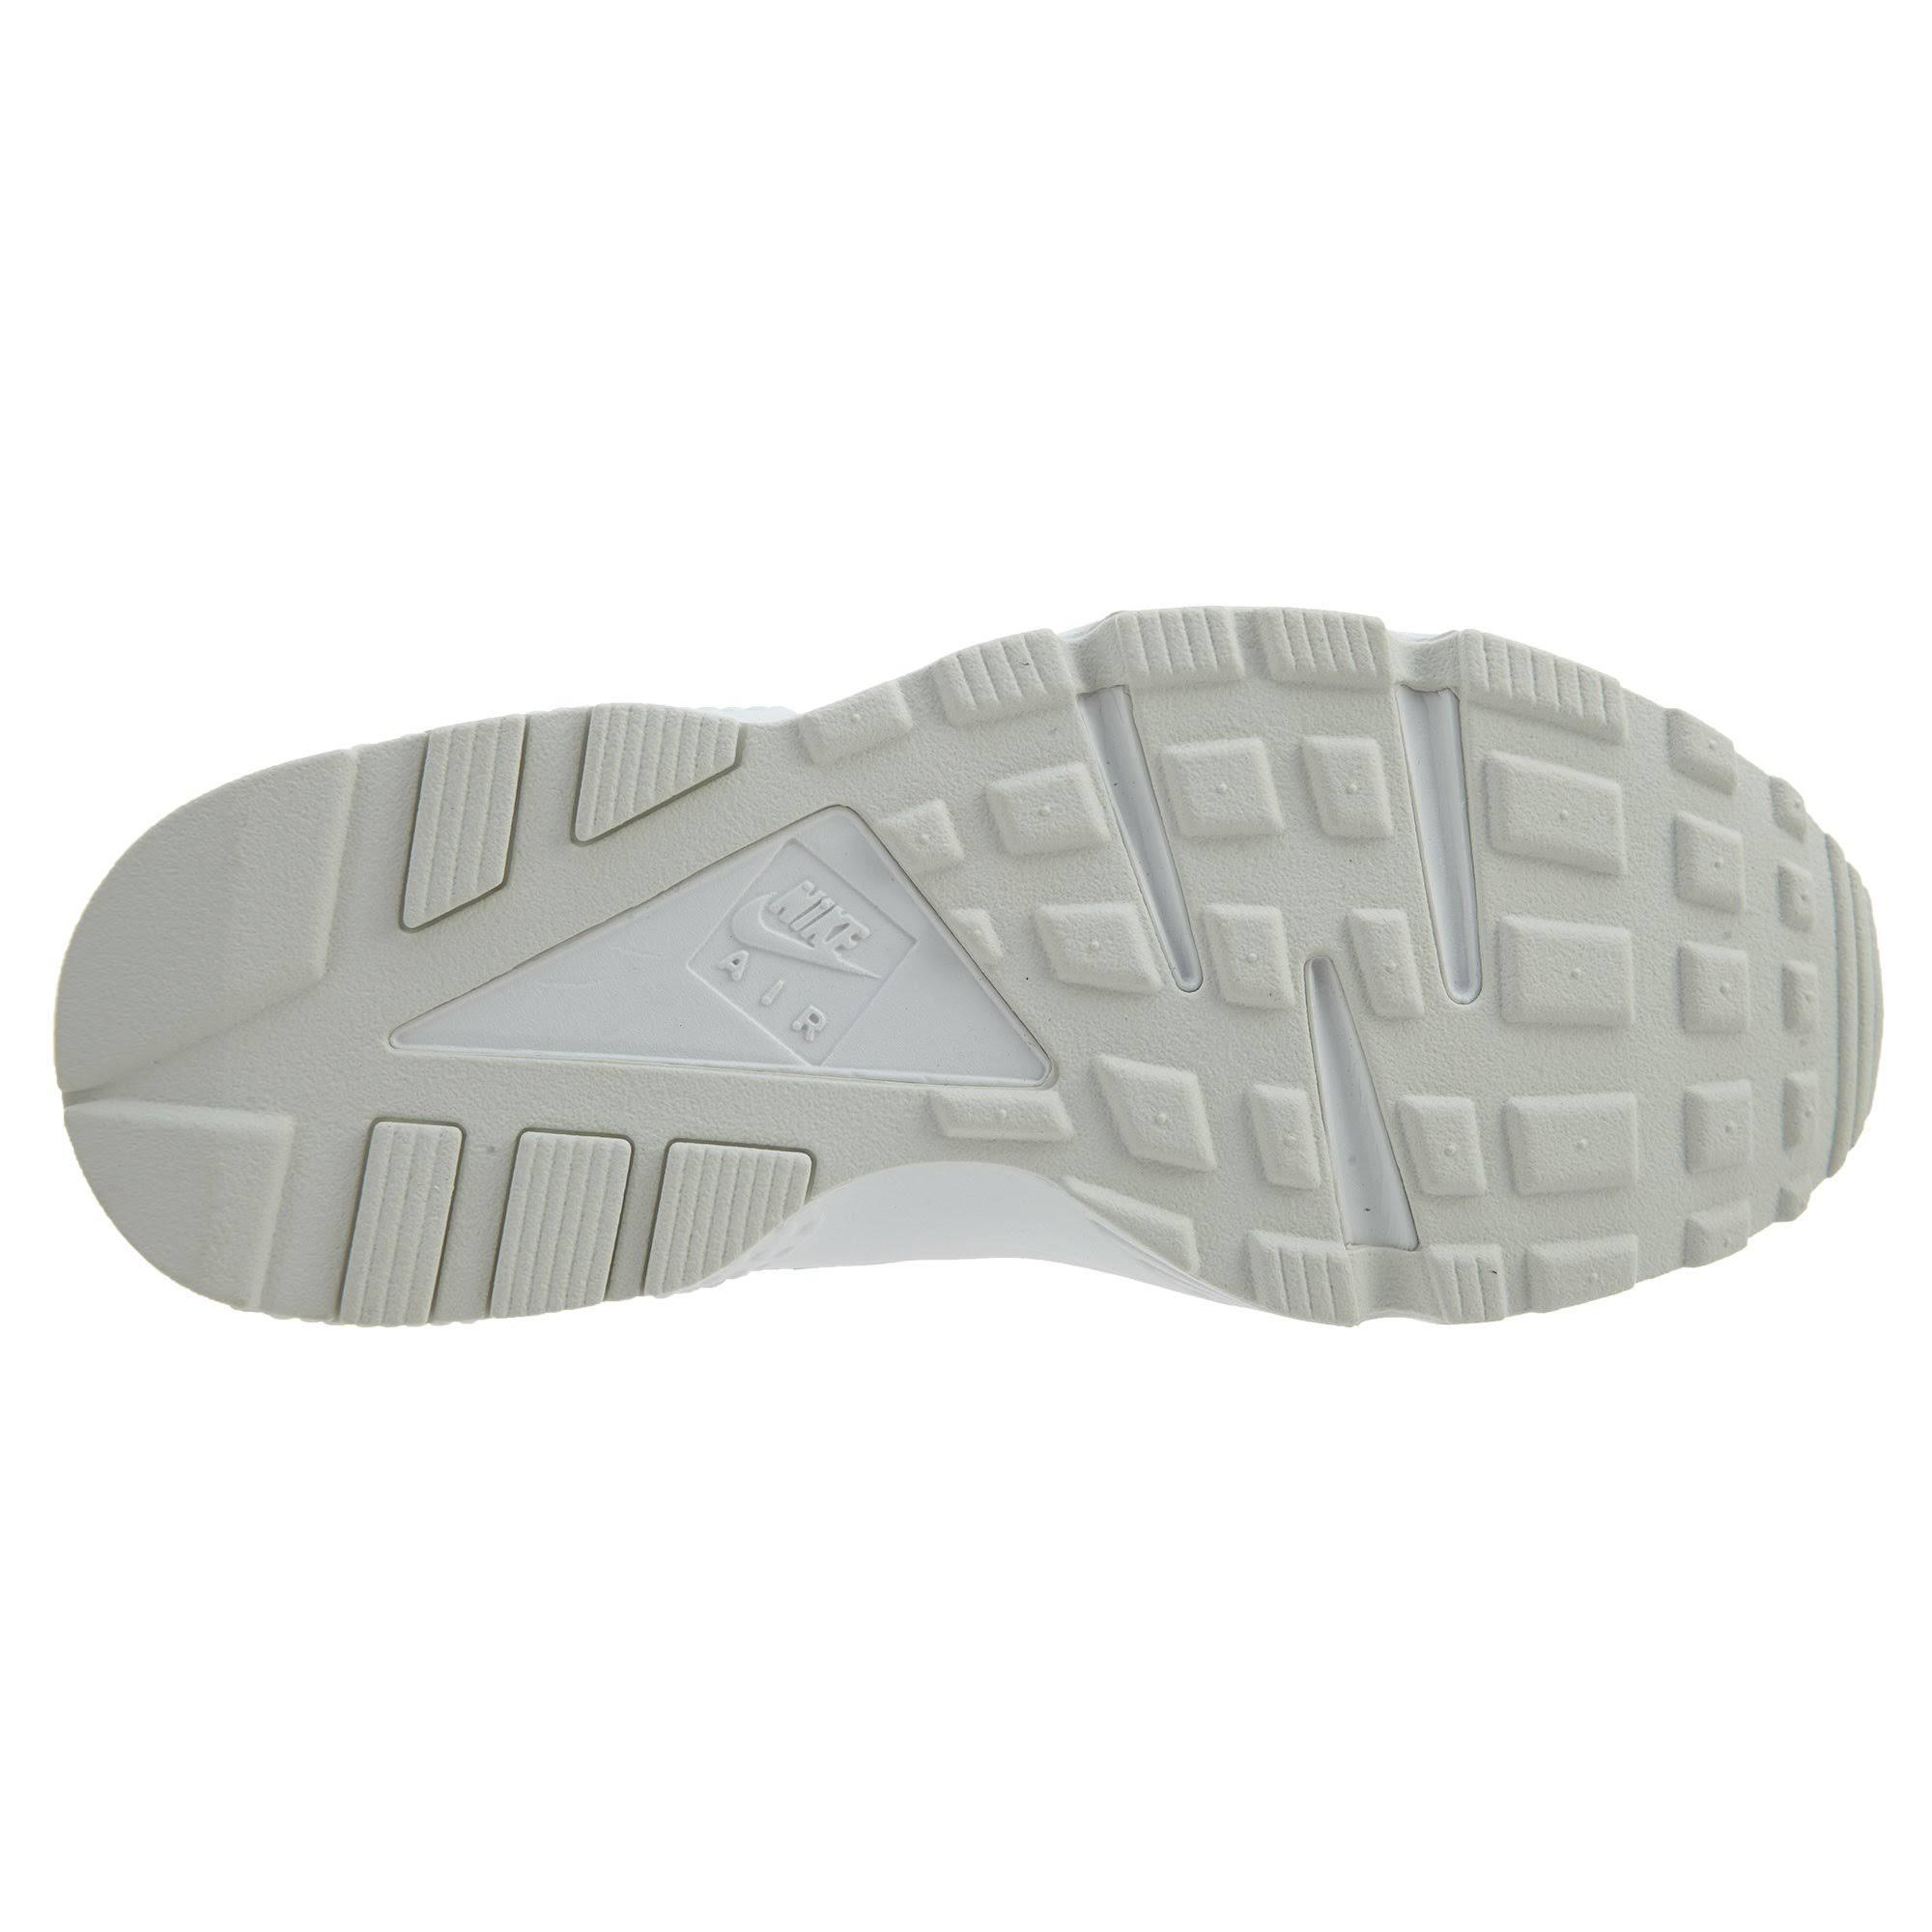 Atmosphere Nike Air Se Universal Shoes Women 859429008 Run Huarache Grey zUwZR